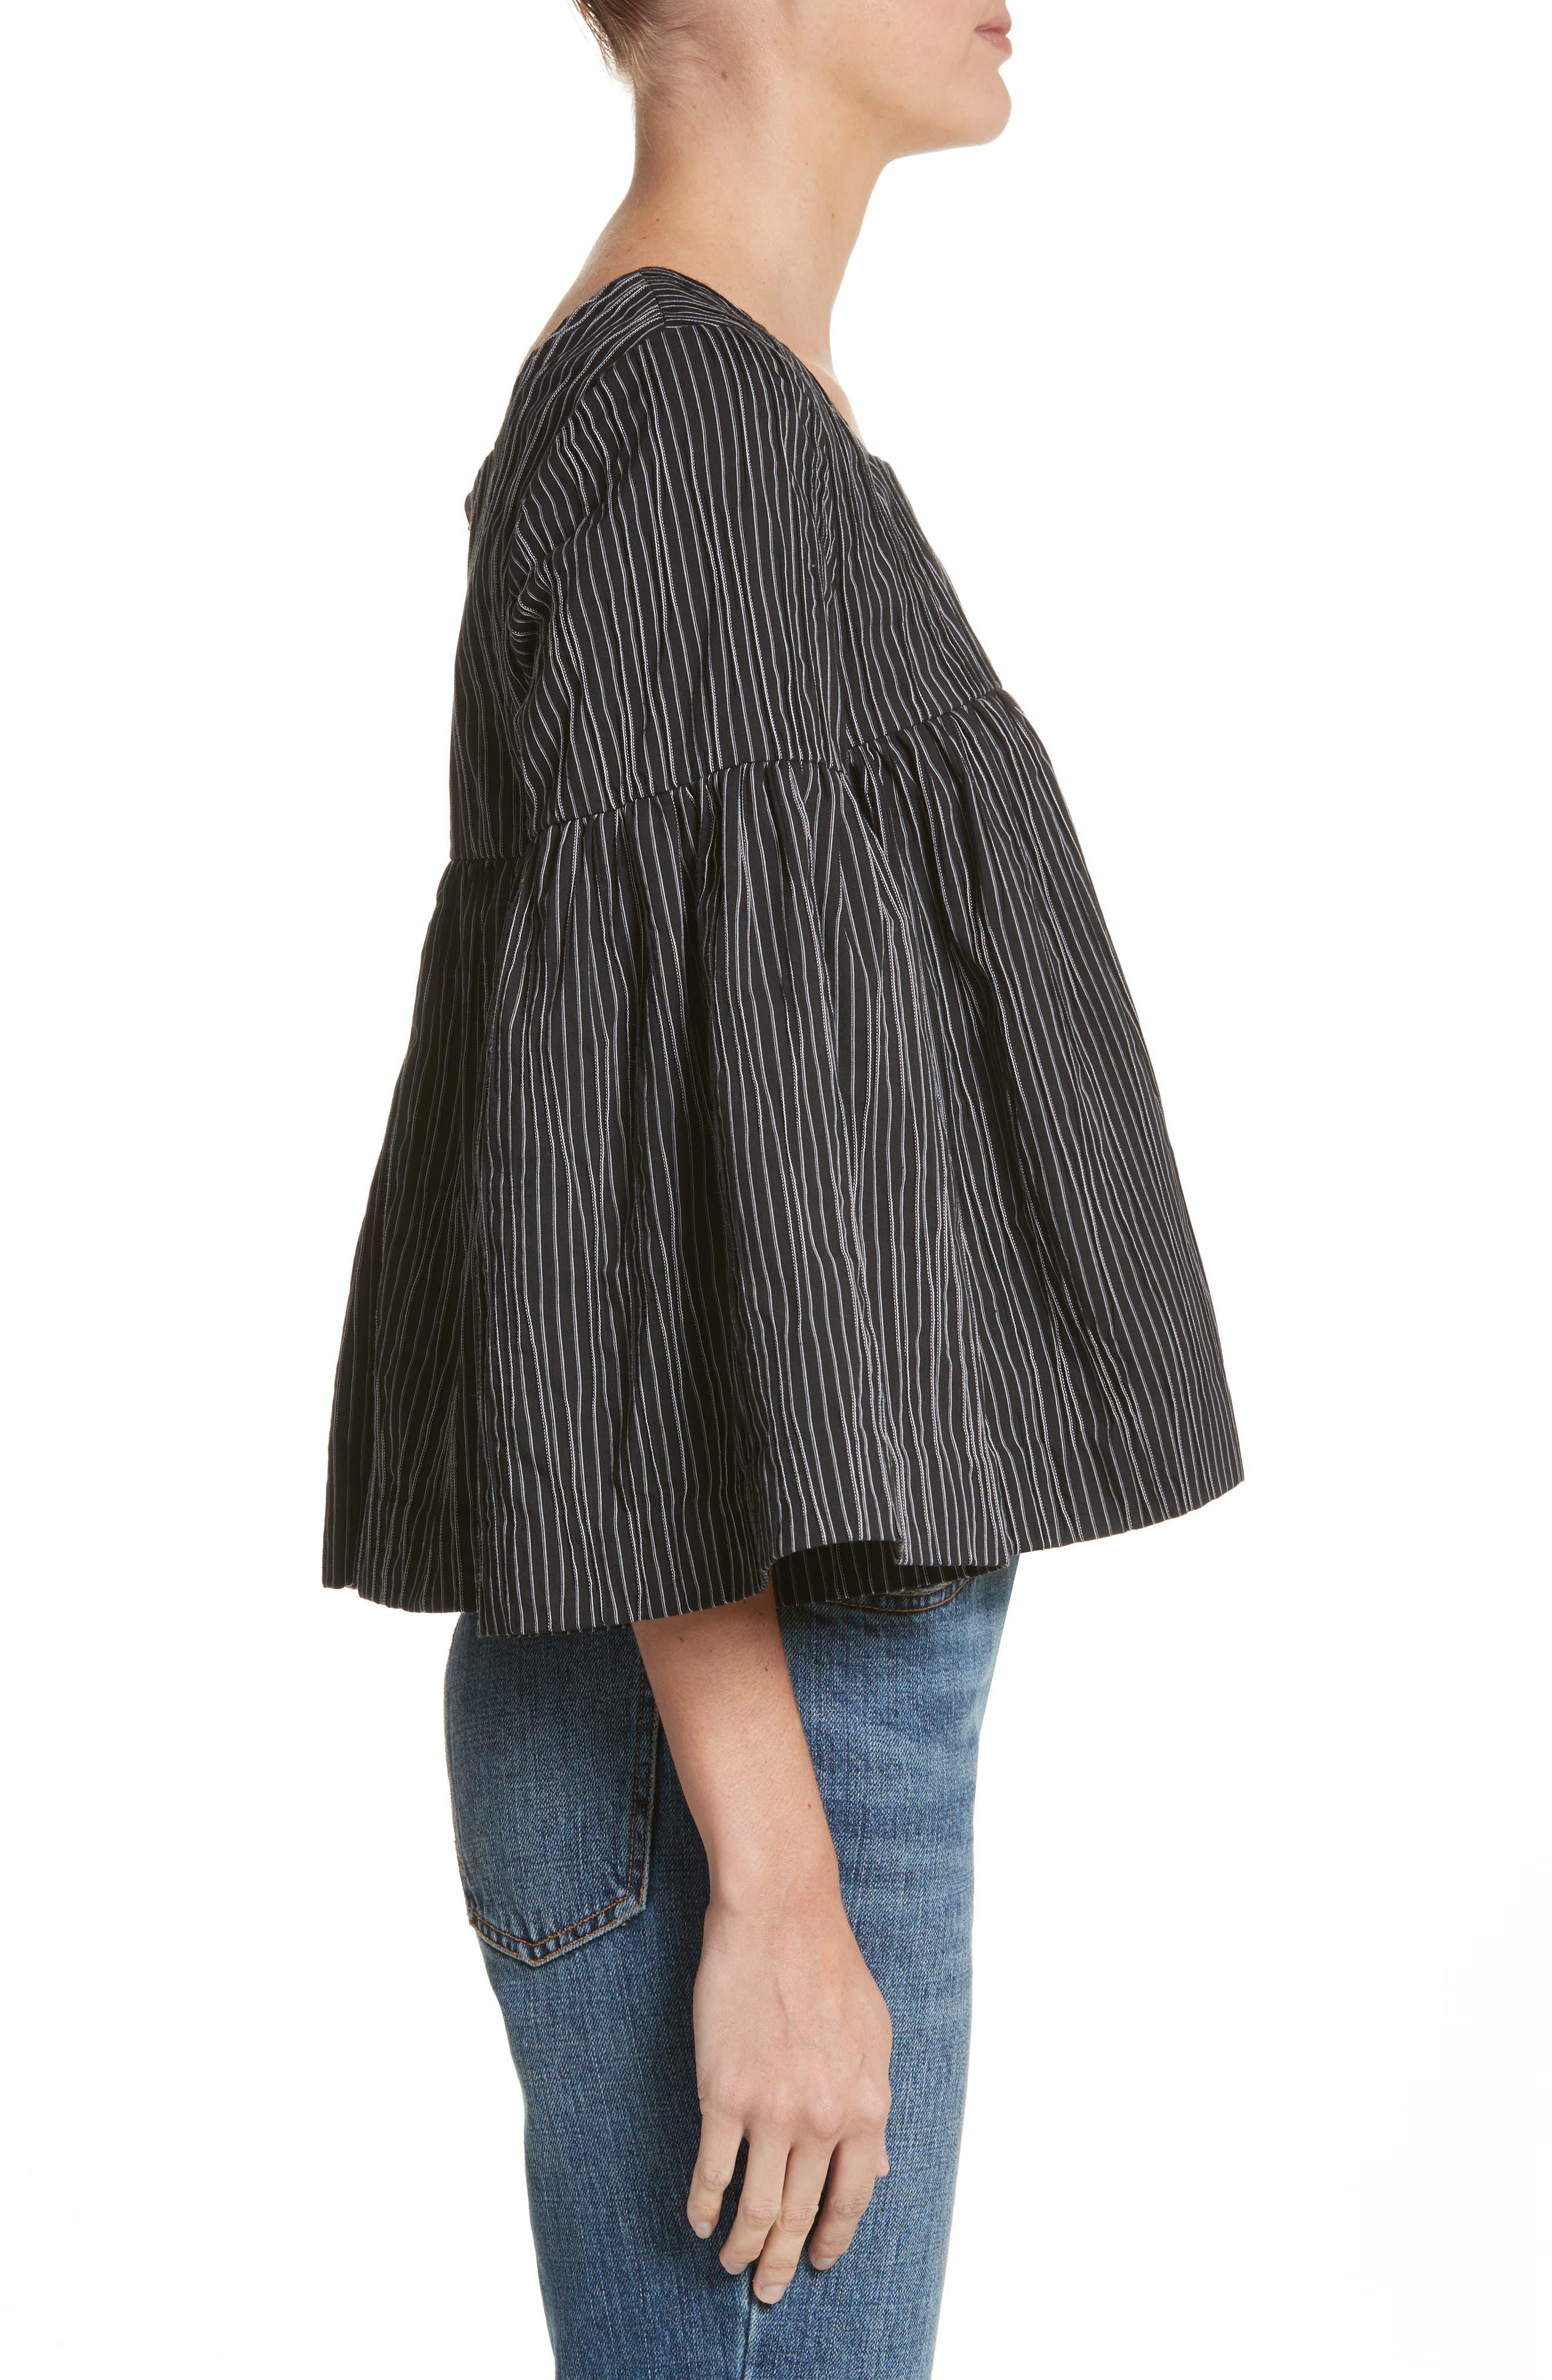 Stripe Crinkle Cotton Blend Swing Top,                             Alternate thumbnail 3, color,                             Black/ White Stripe